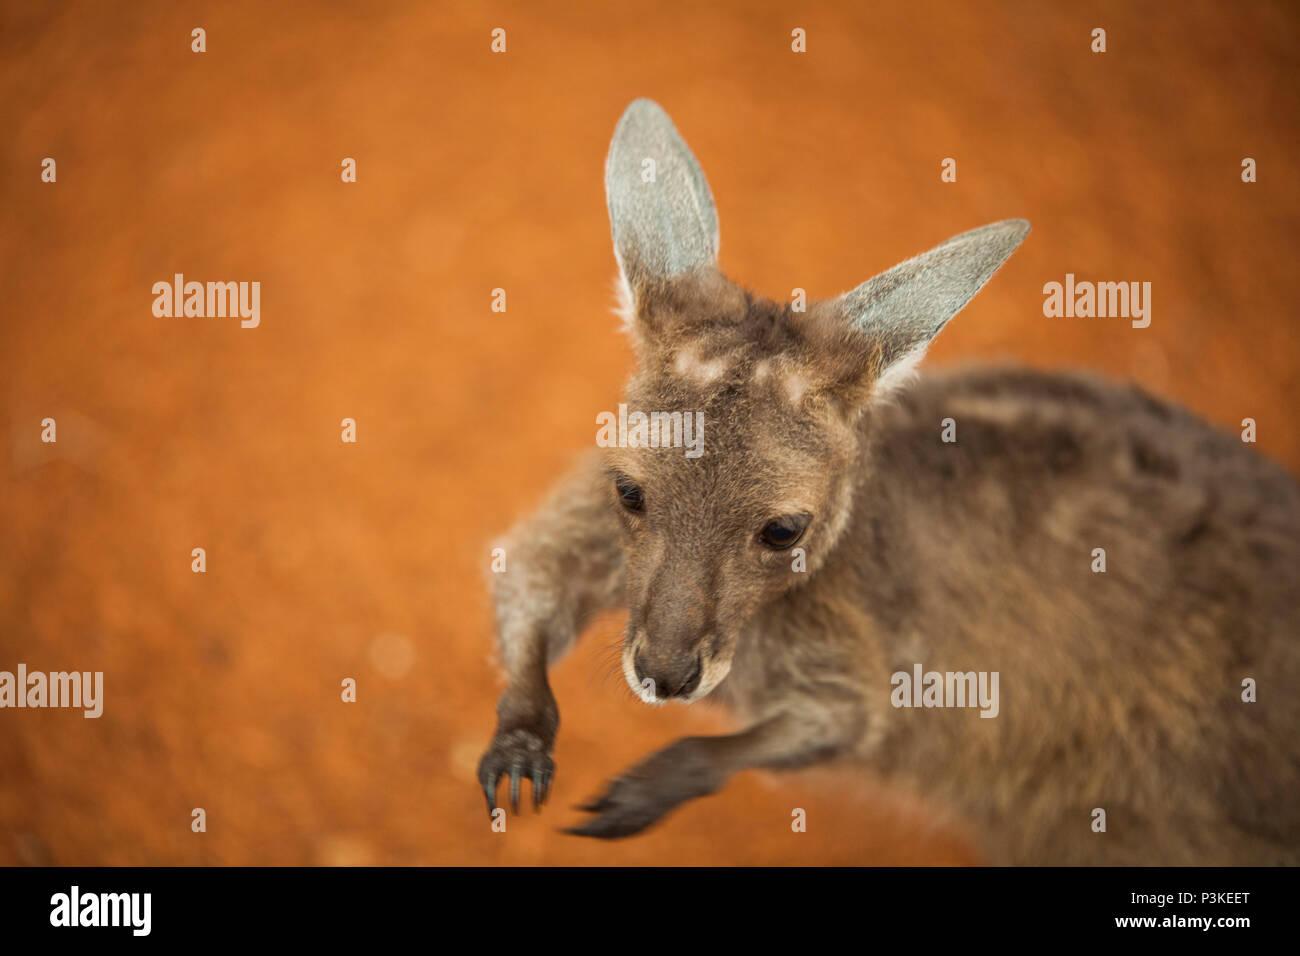 Bébé kangourou (Joey), Zoo de Perth, Australie occidentale Photo Stock